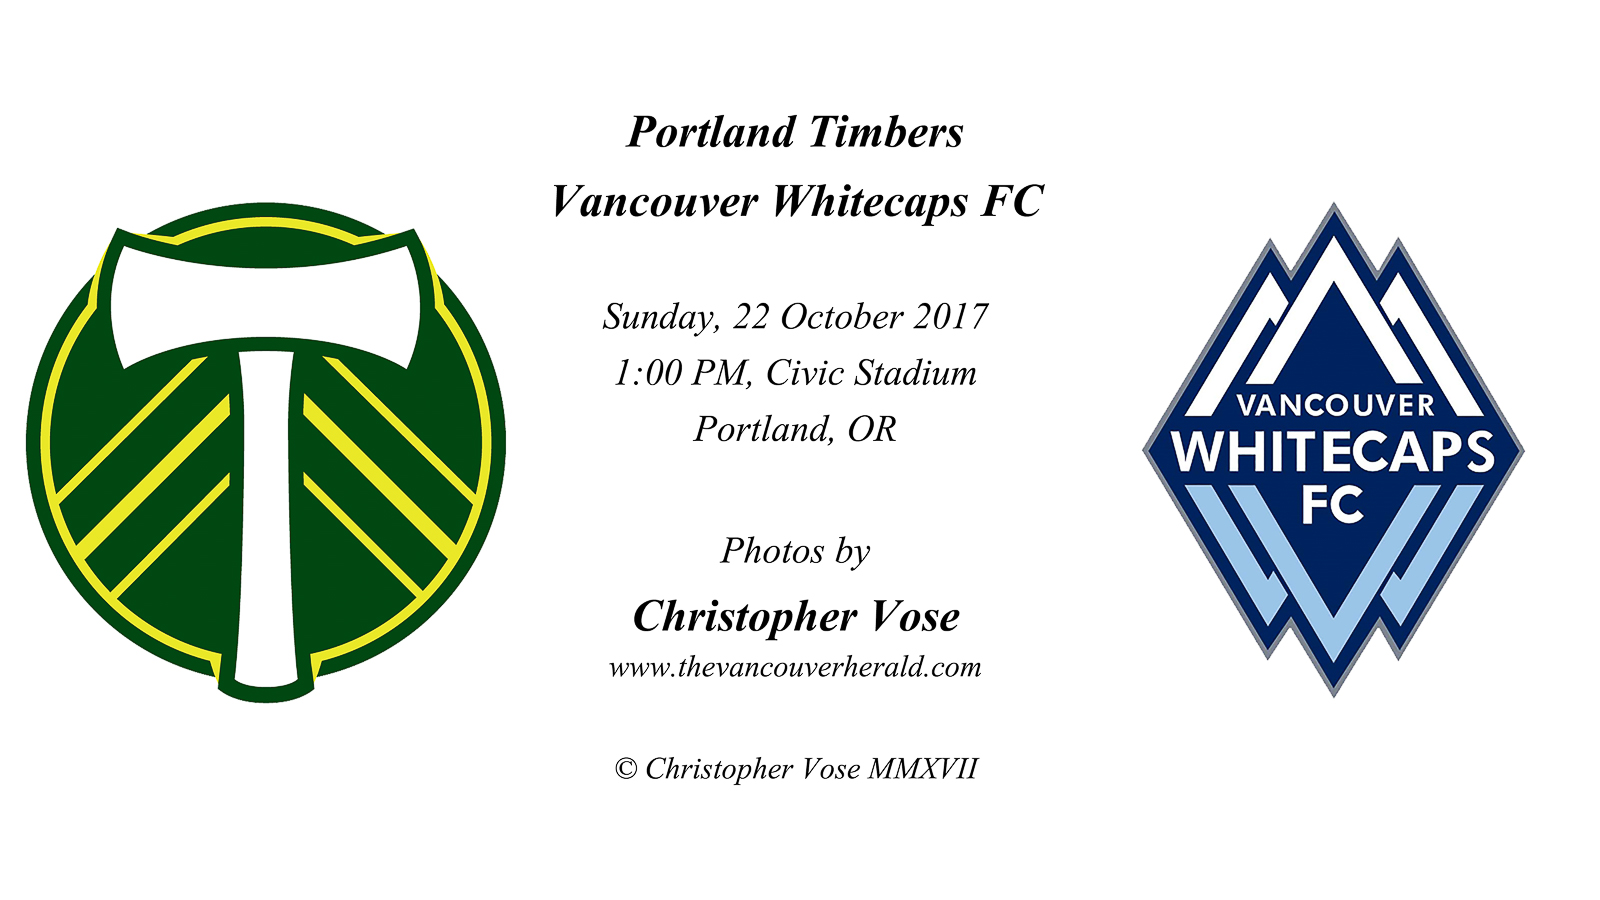 2017-10-22 Portland Timbers v Vancouver Whitecaps FC.jpg